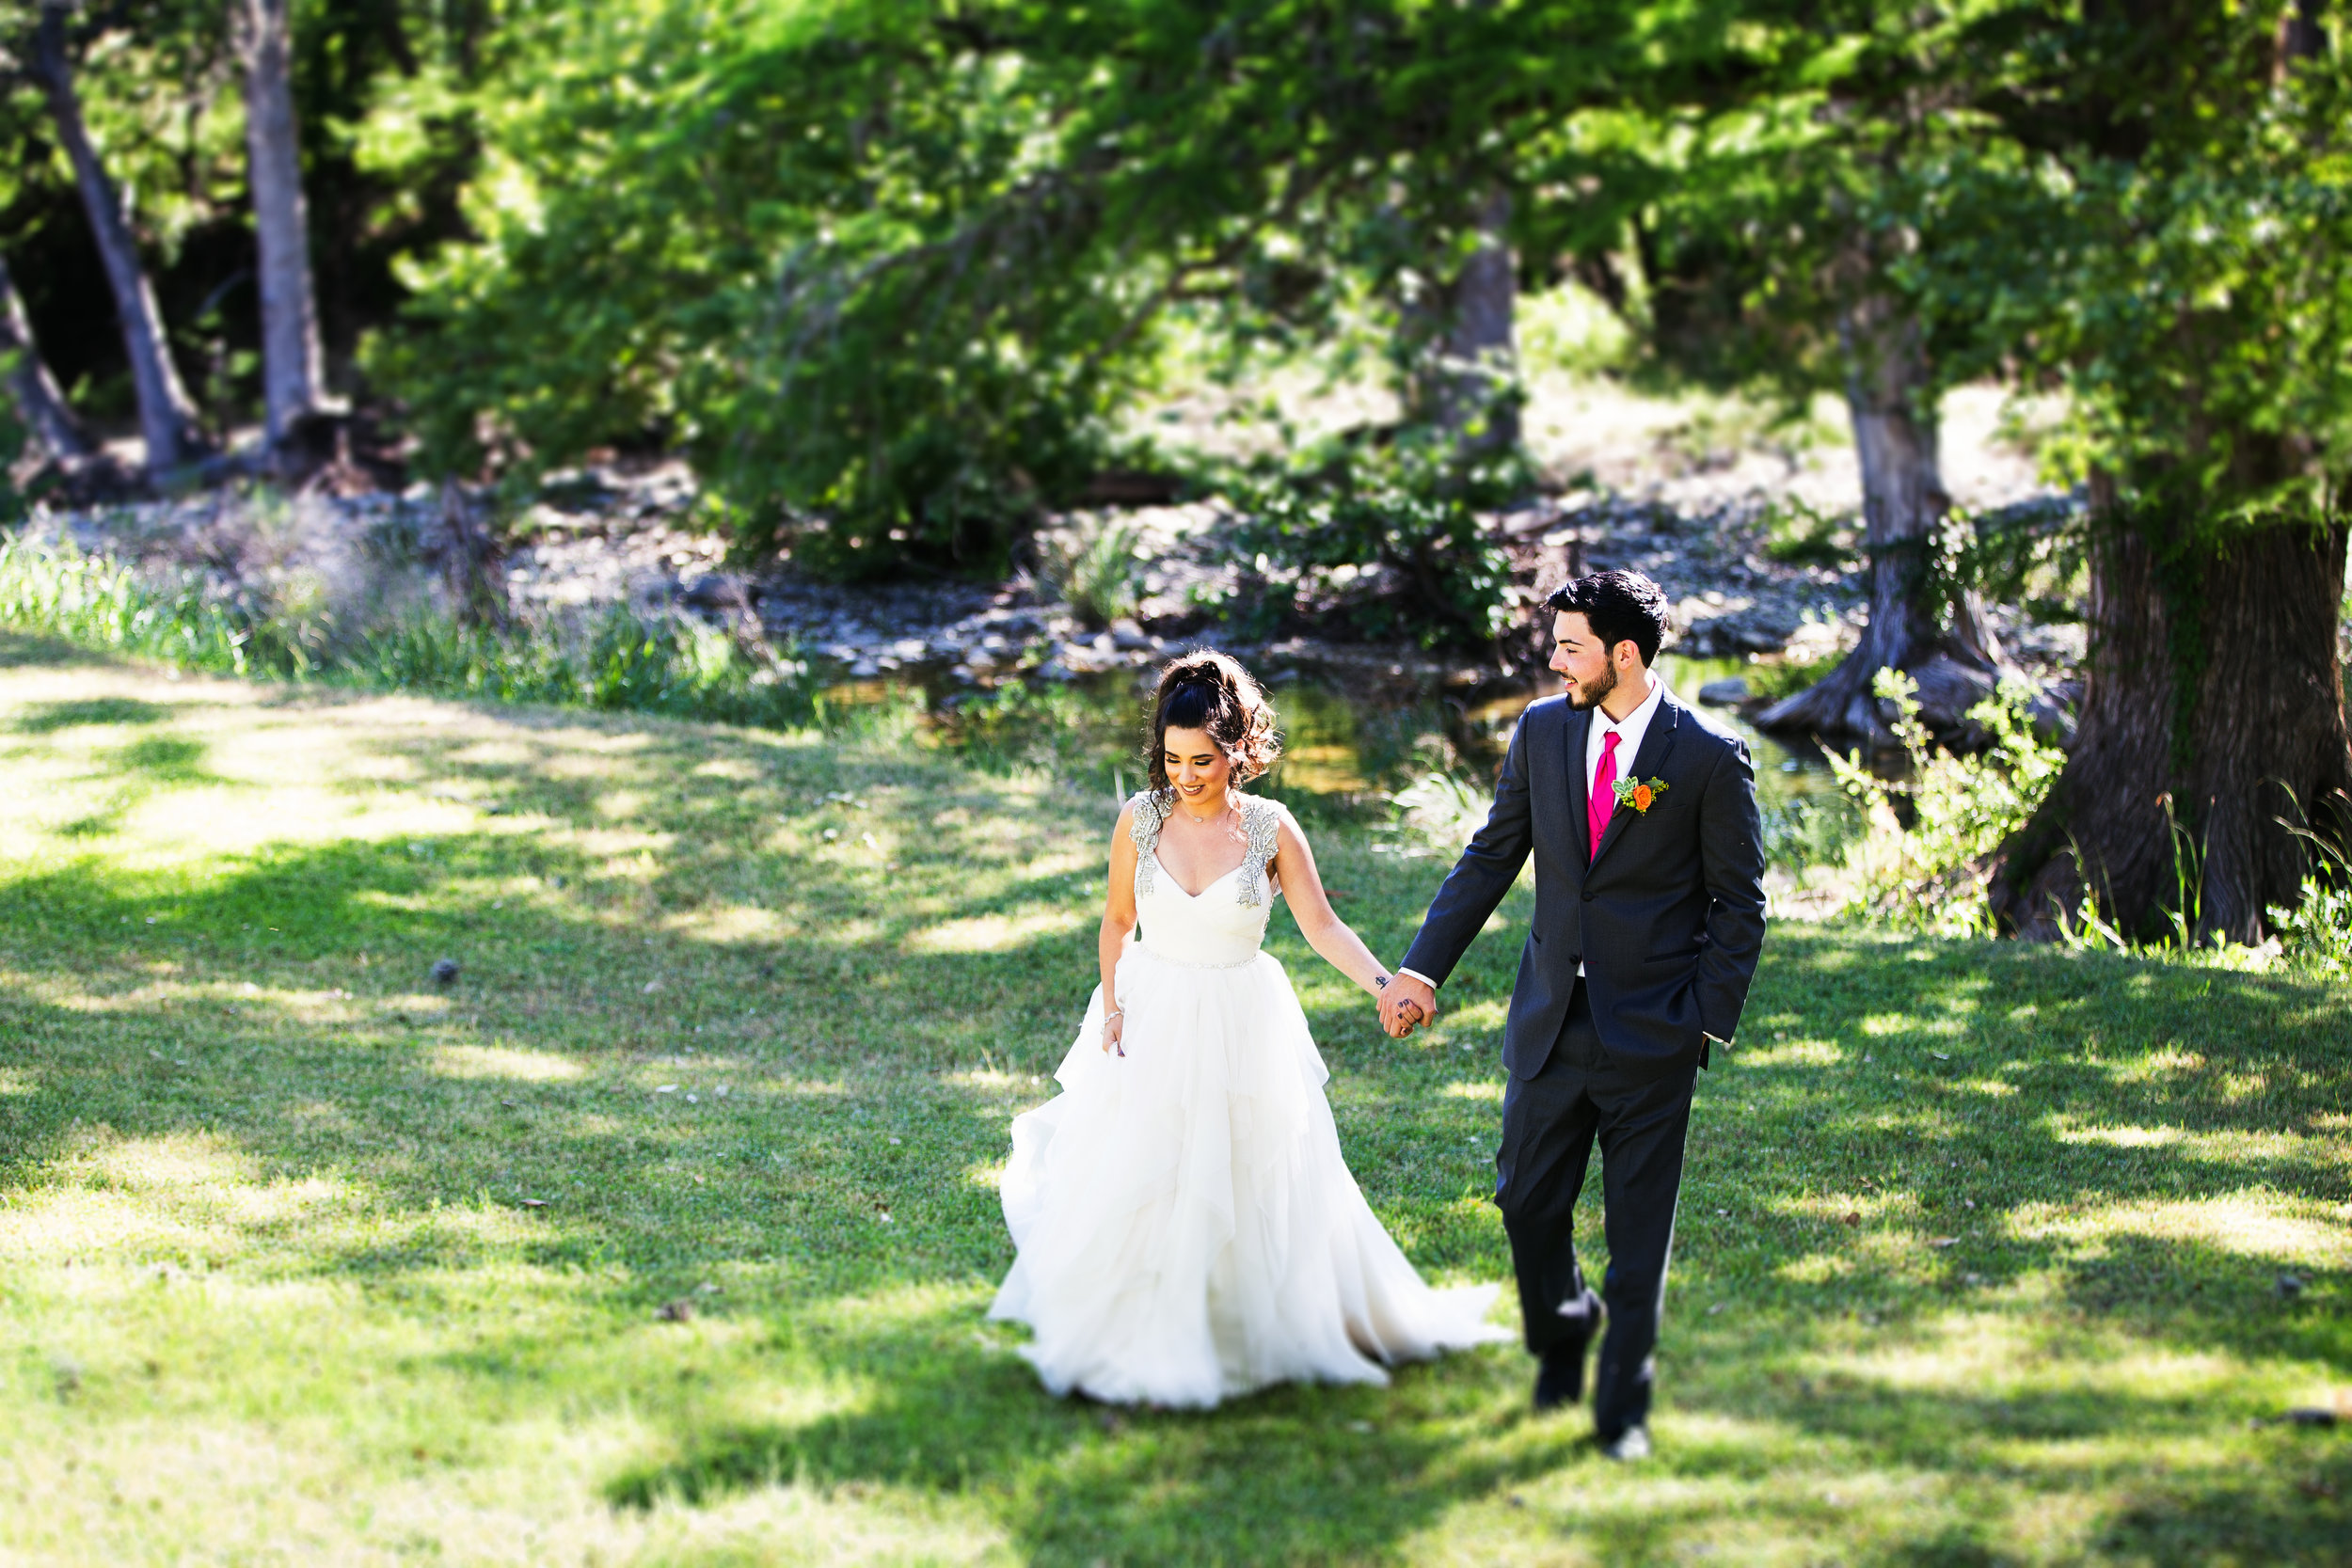 New York City wedding, engagement, and lifestyle photographer Stephanie Hanson Photo.